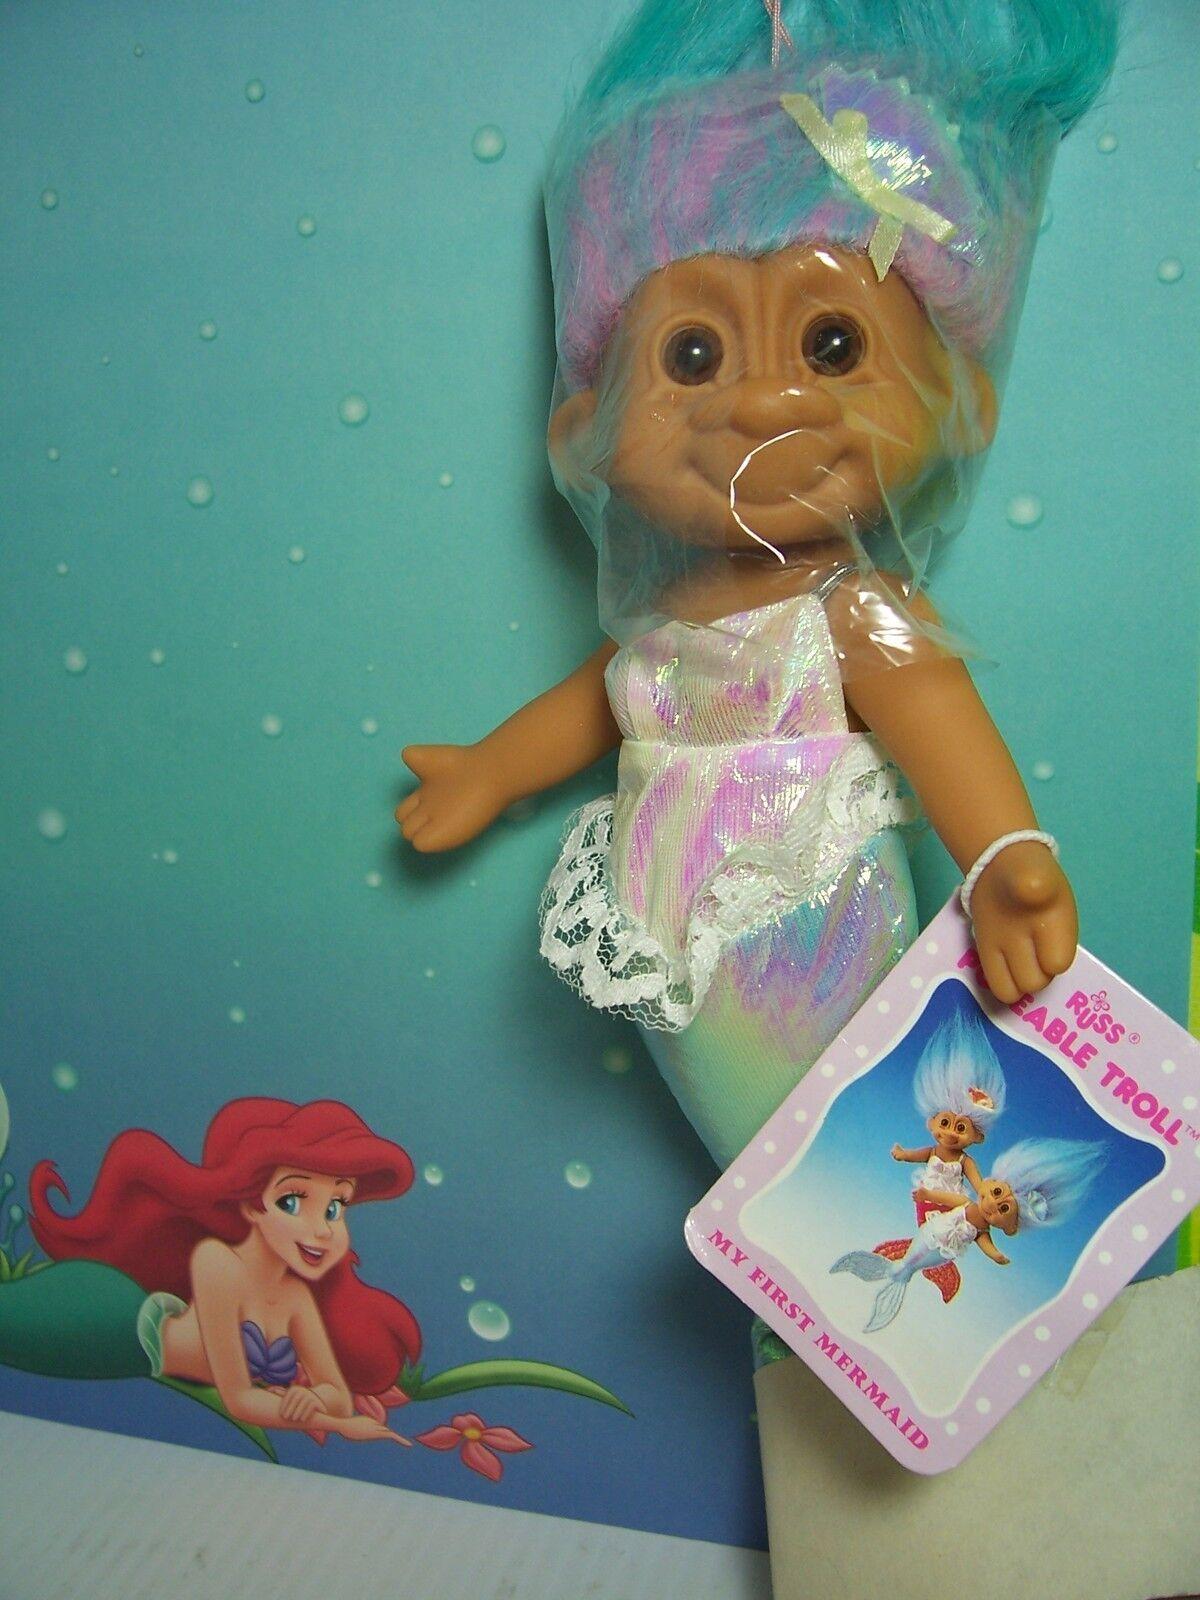 AQUA HANG HANGING MERMAID WITH HANG AQUA TAG - 9  Russ Troll Doll - NEW - Last Of Farbe bdb048